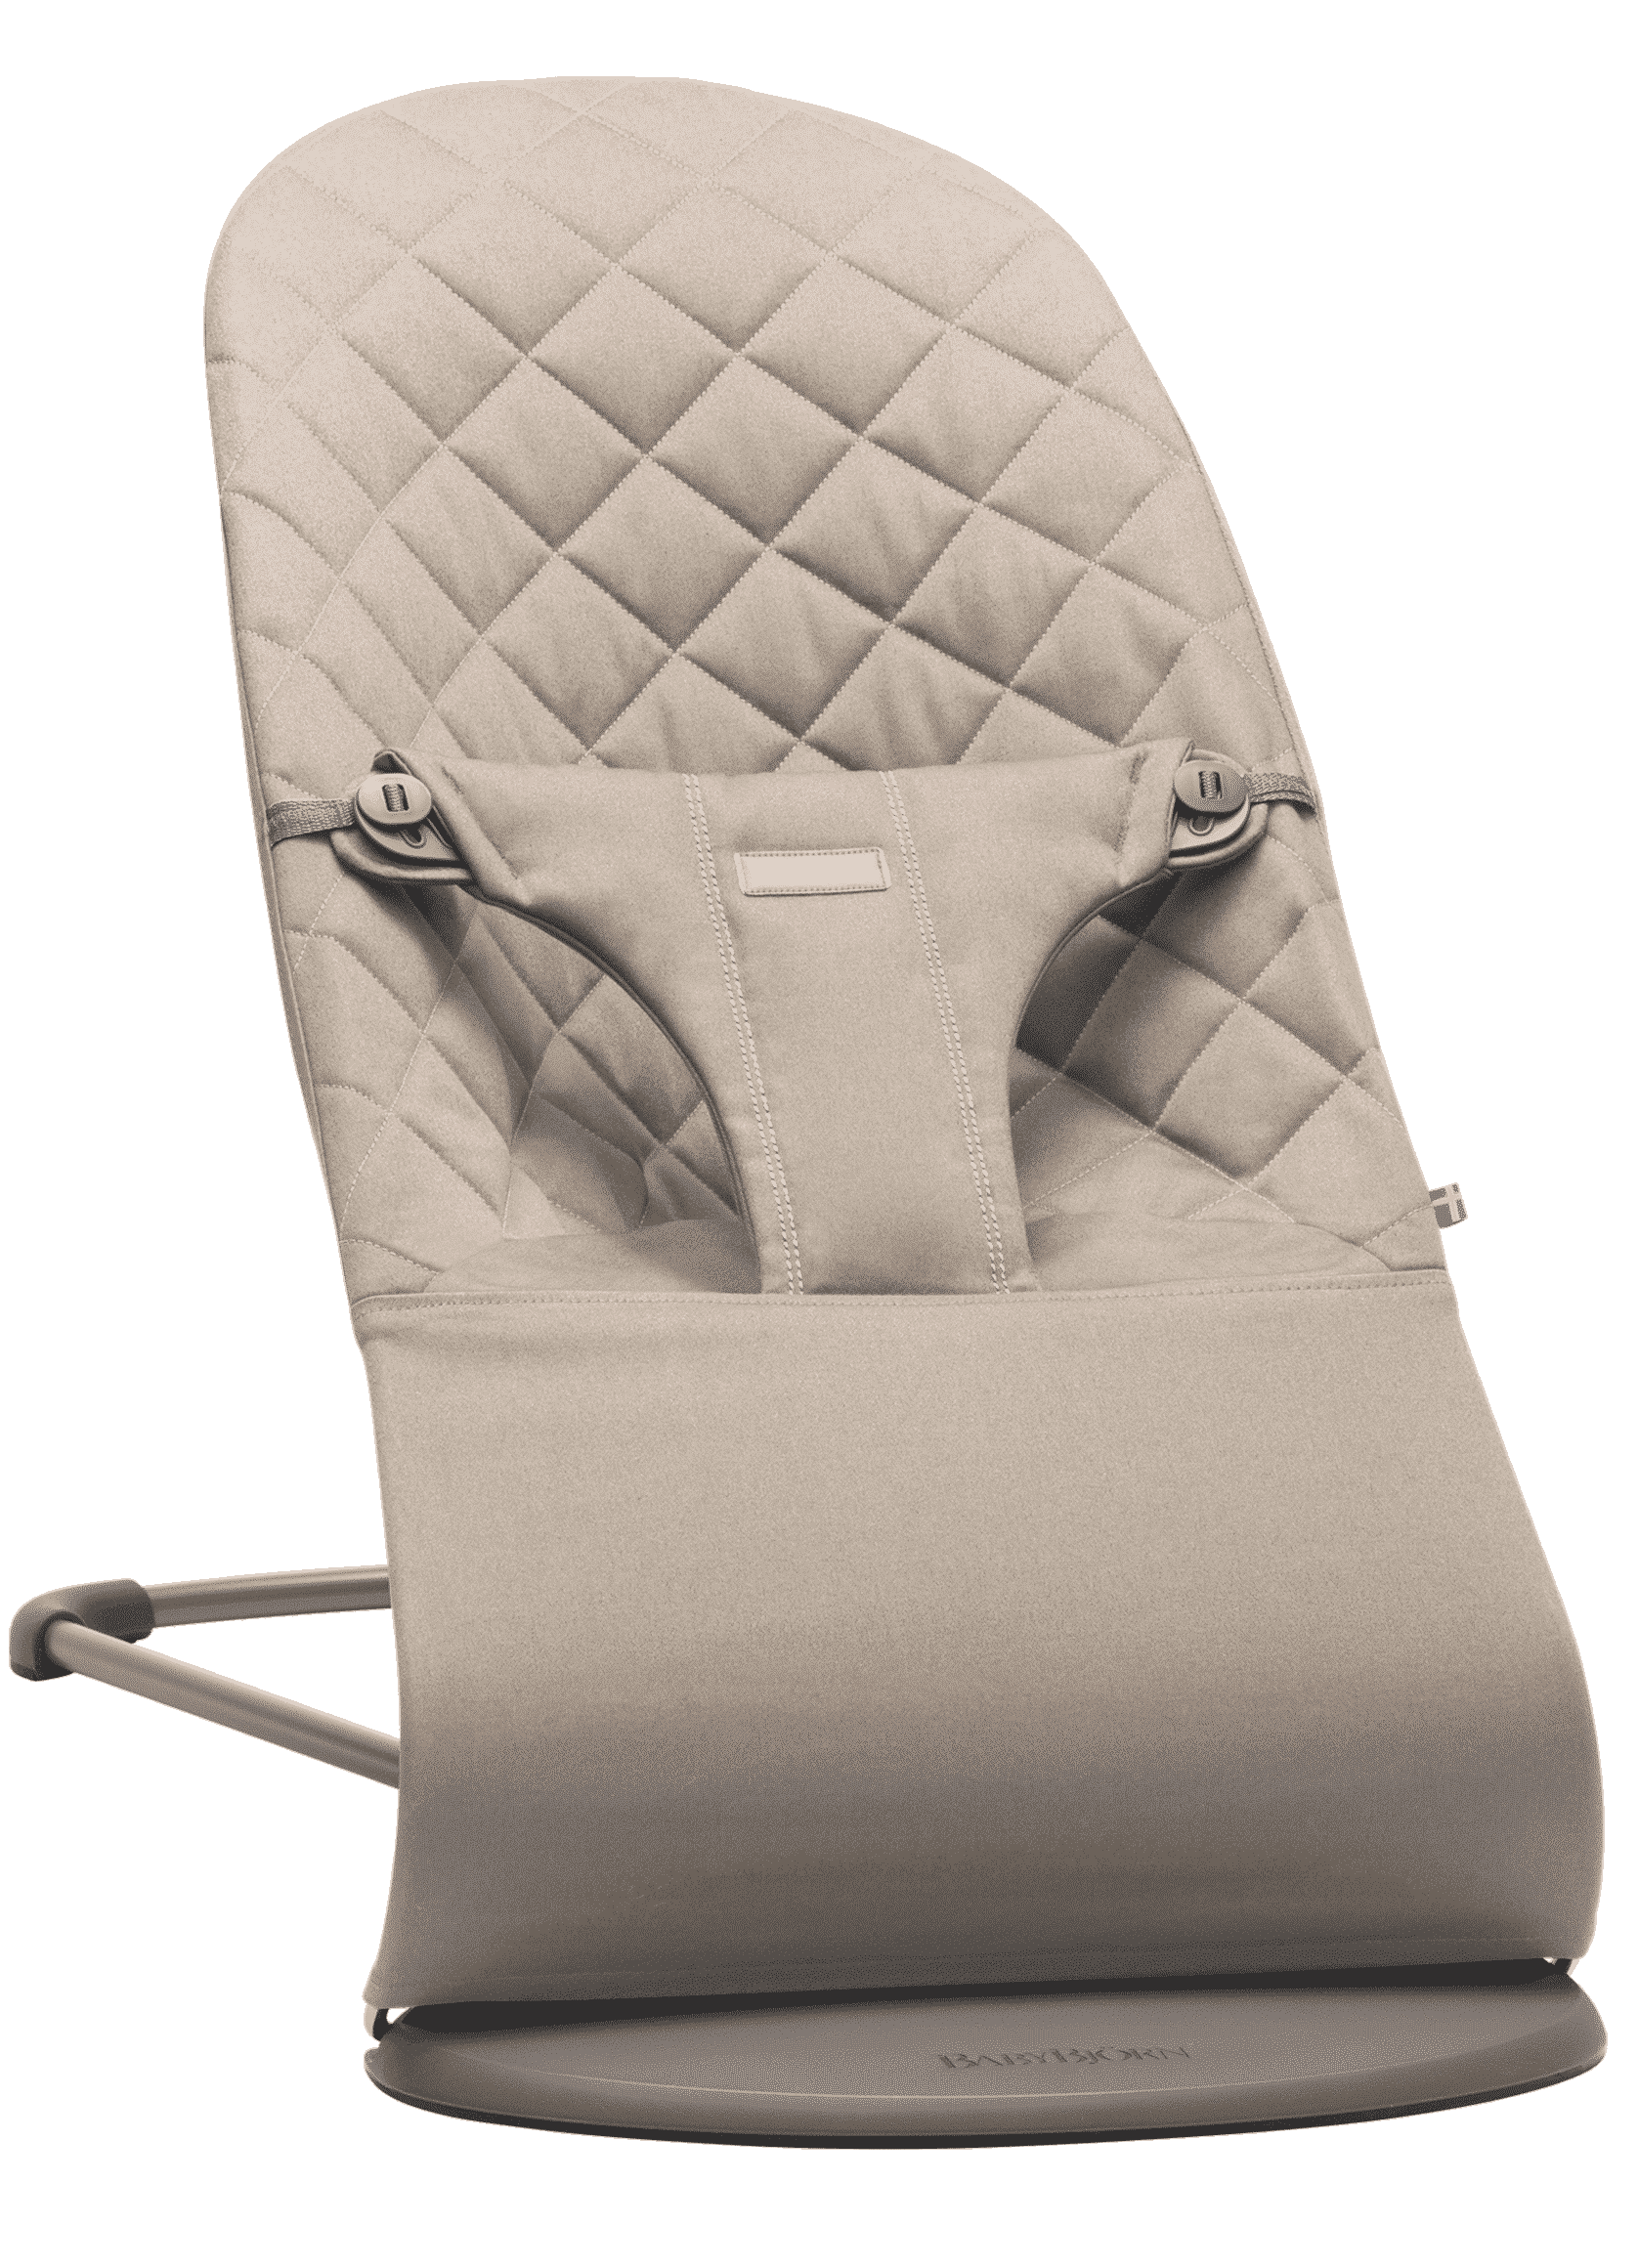 Ležaljka bliss – siva